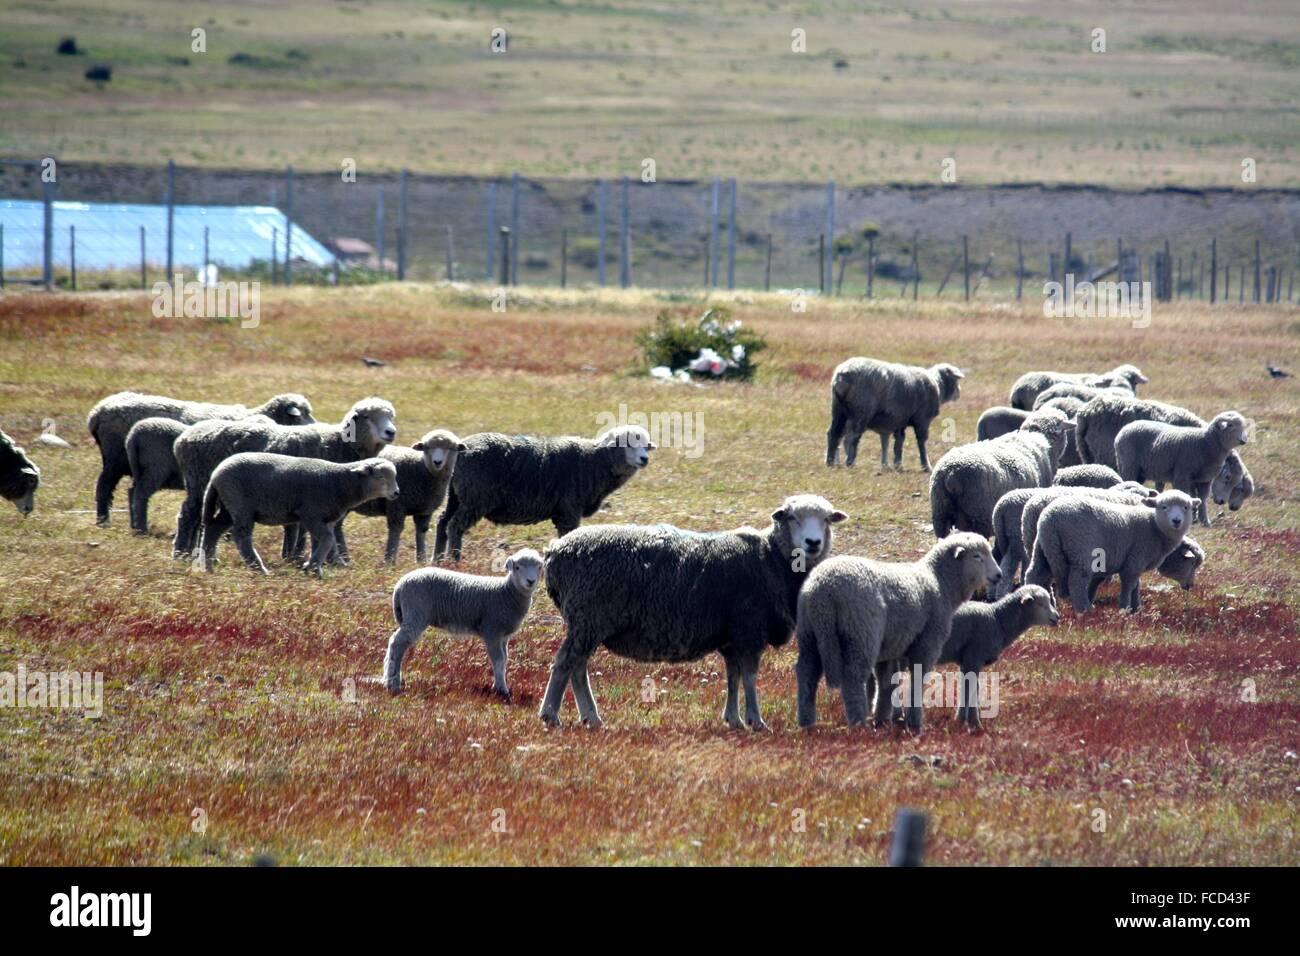 Flock Of Sheep On A Pastureland - Stock Image